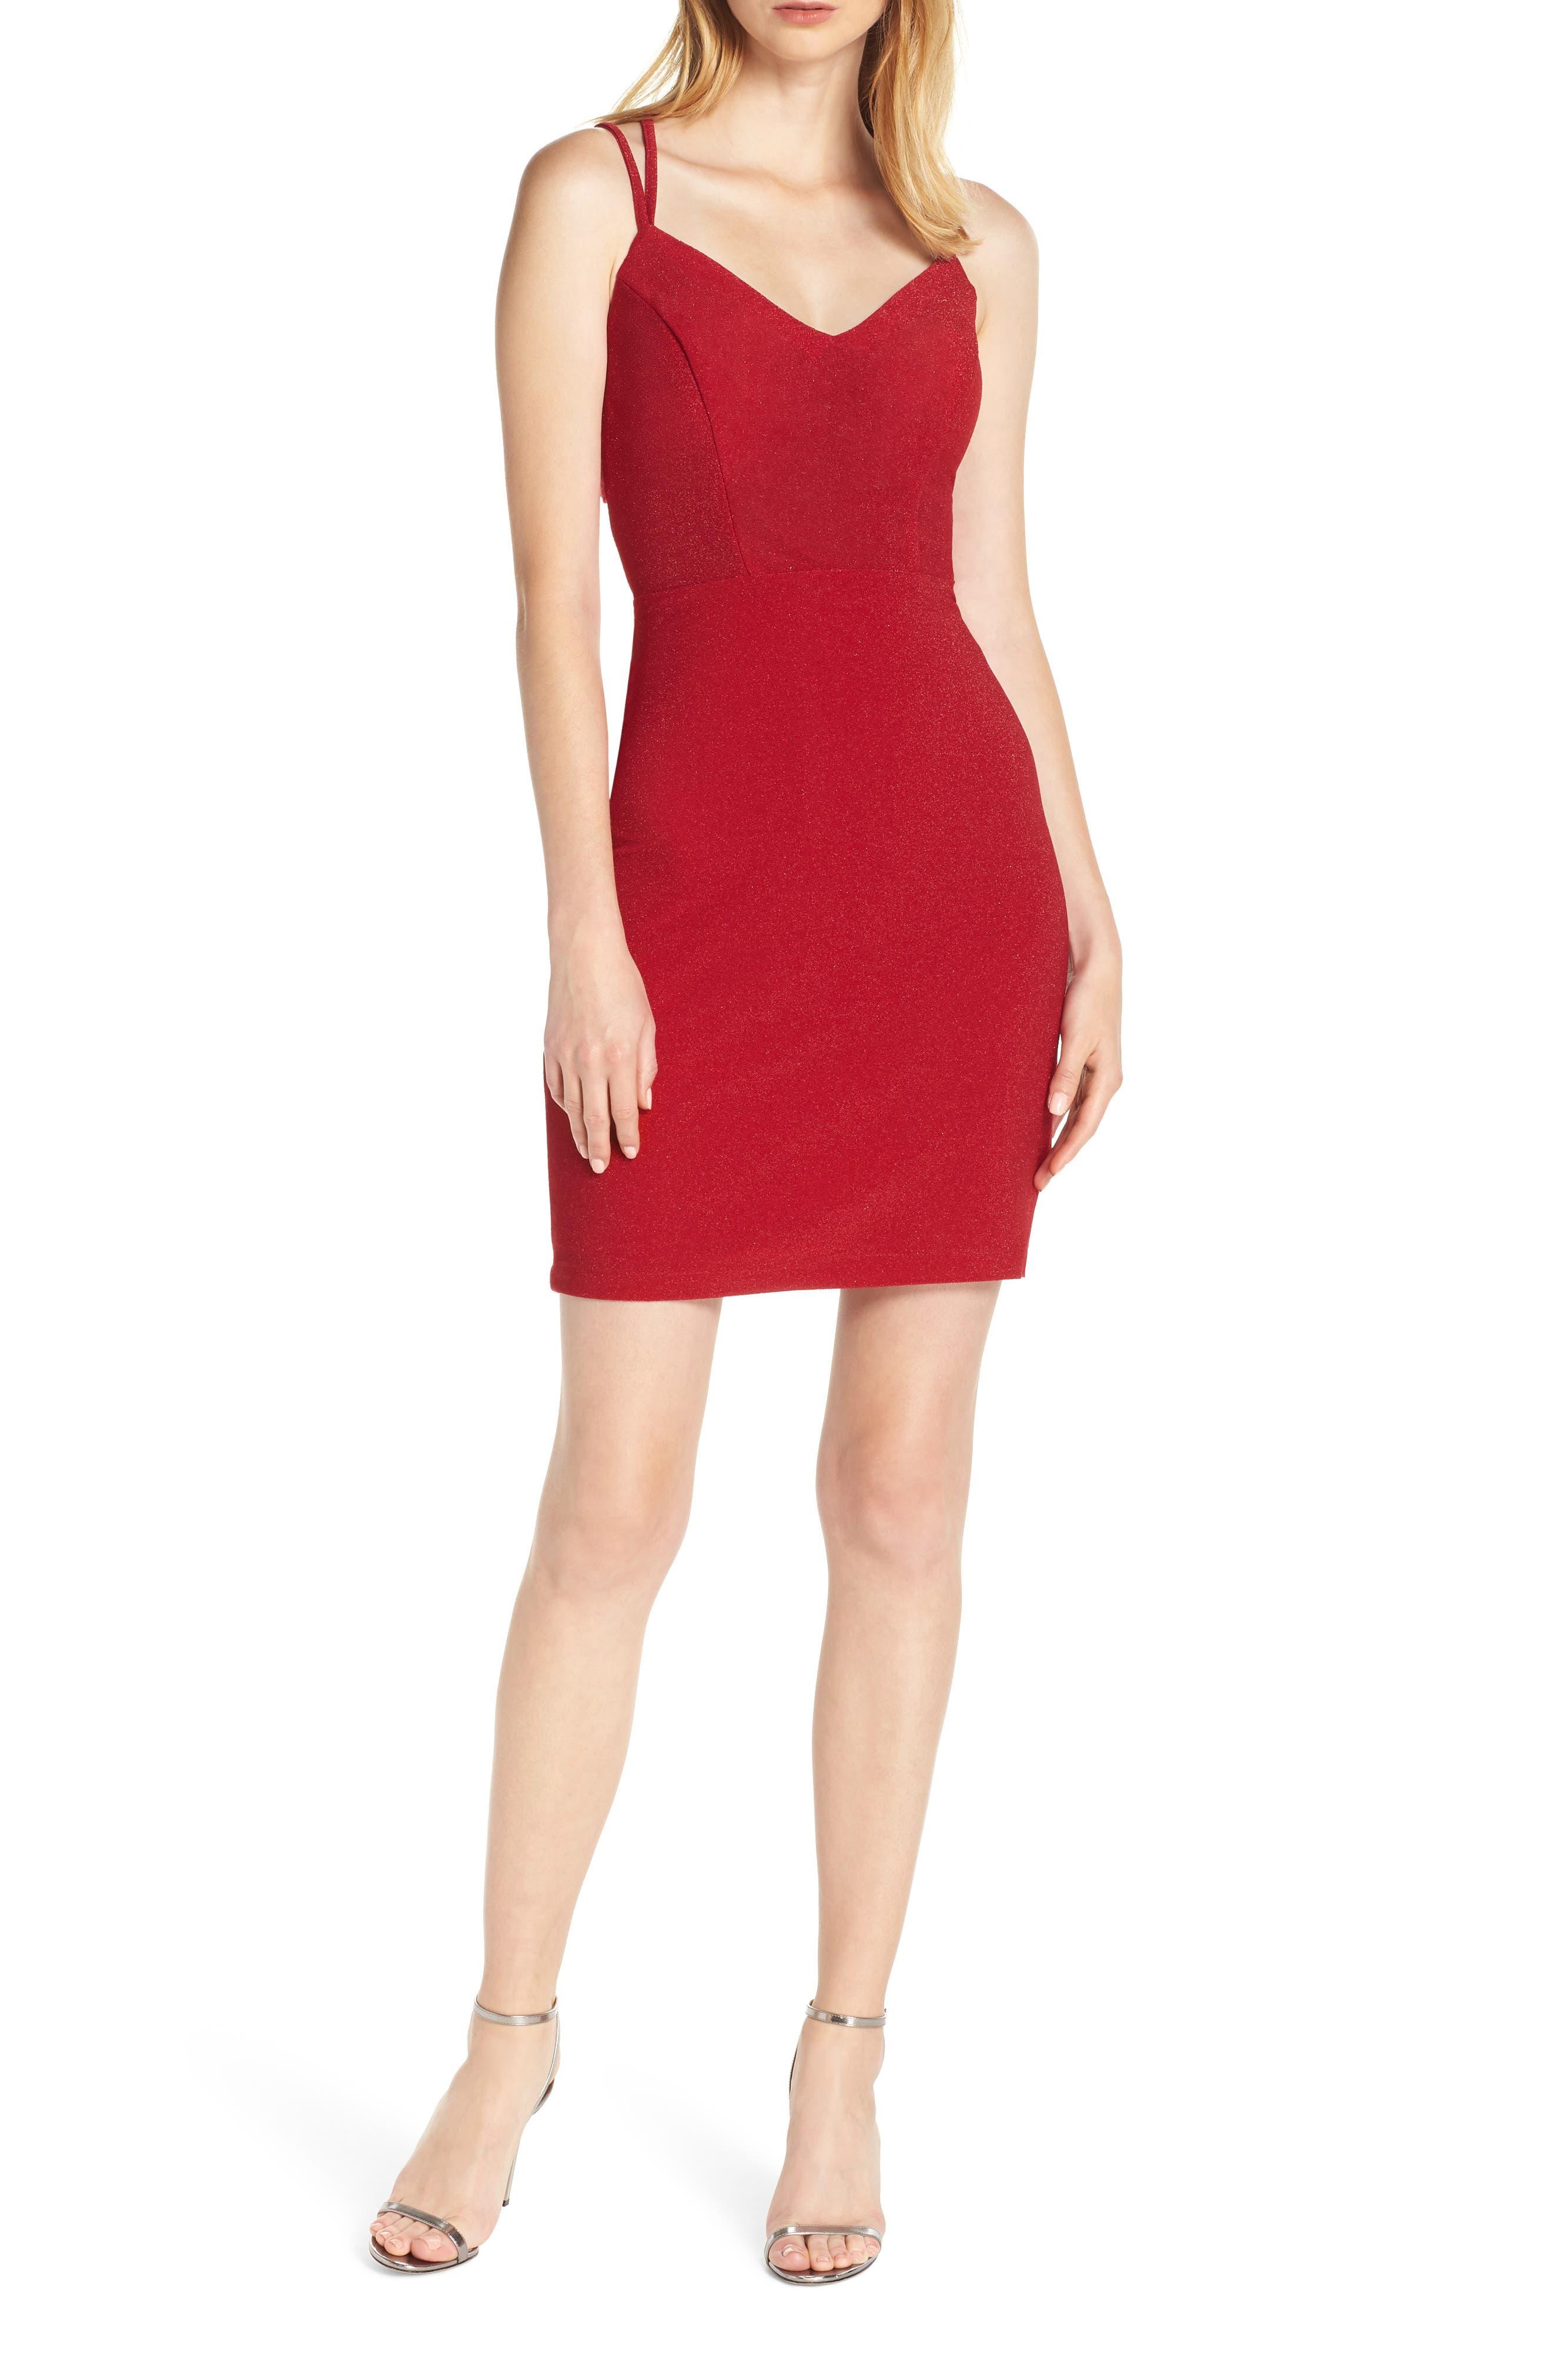 Morgan & Co. Strappy Glitter Knit Dress, Red